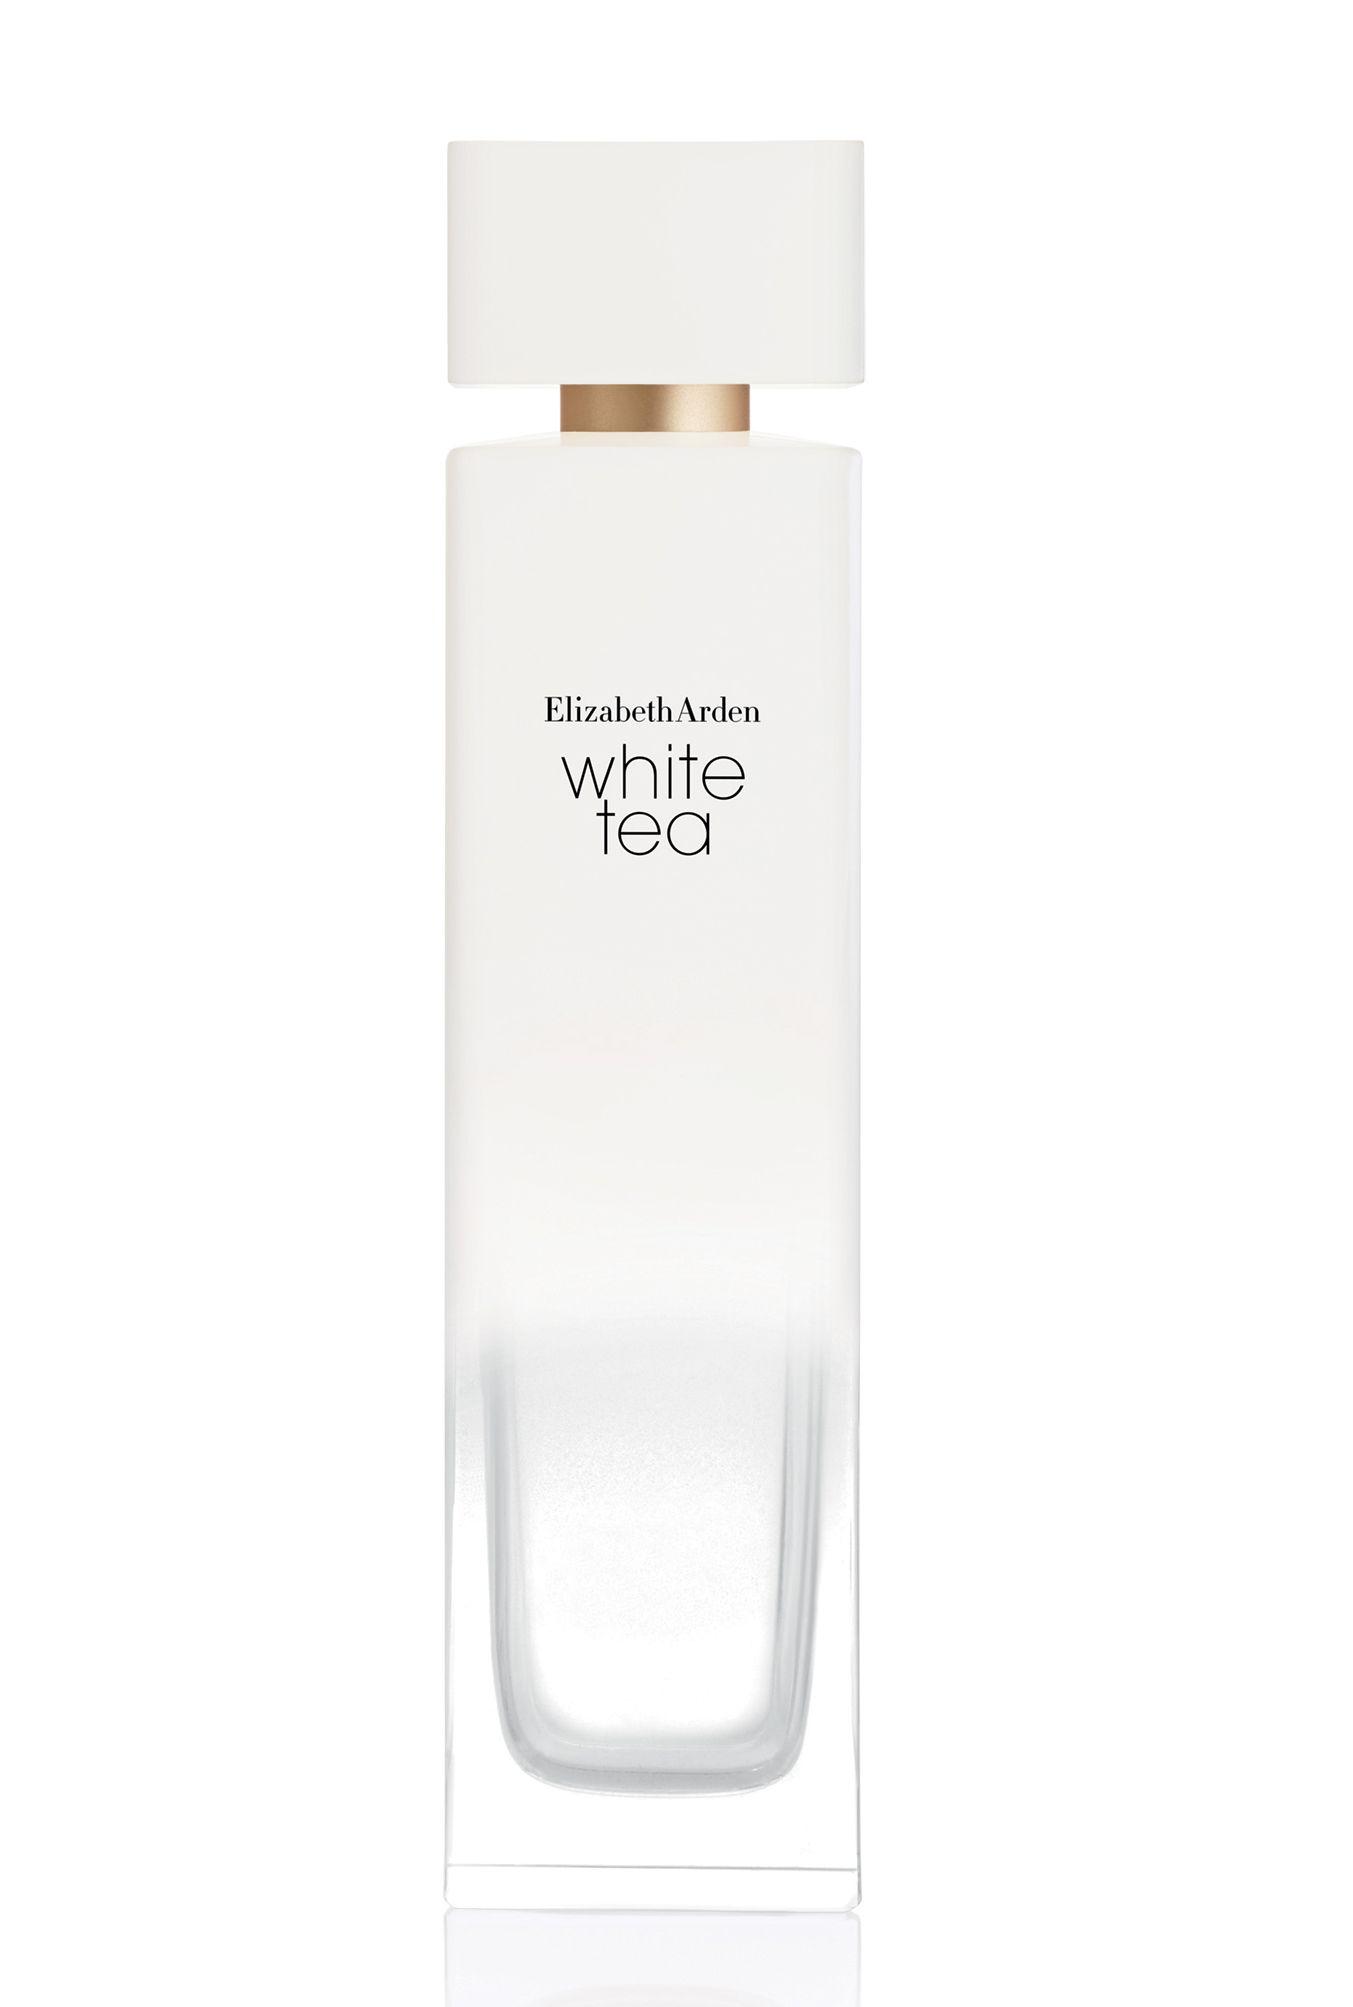 Elizabeth Arden New Perfume 2017